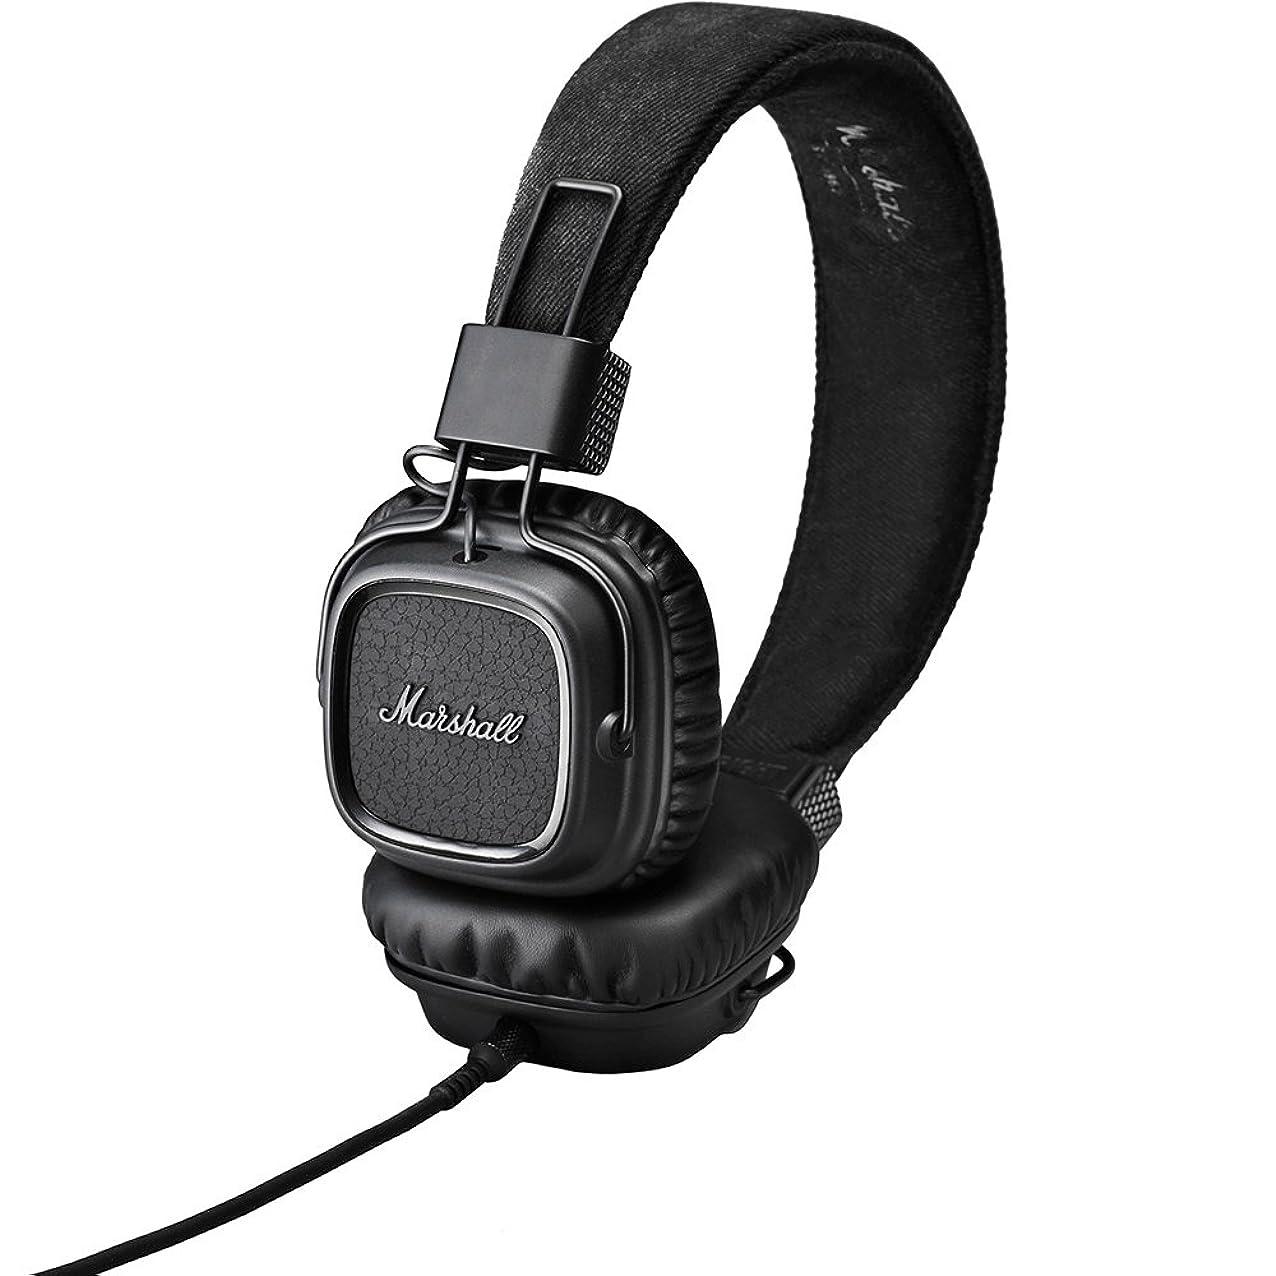 Marshall Major On-Ear Headphones, Pitch Black (4091114) labadigqwgxmd850